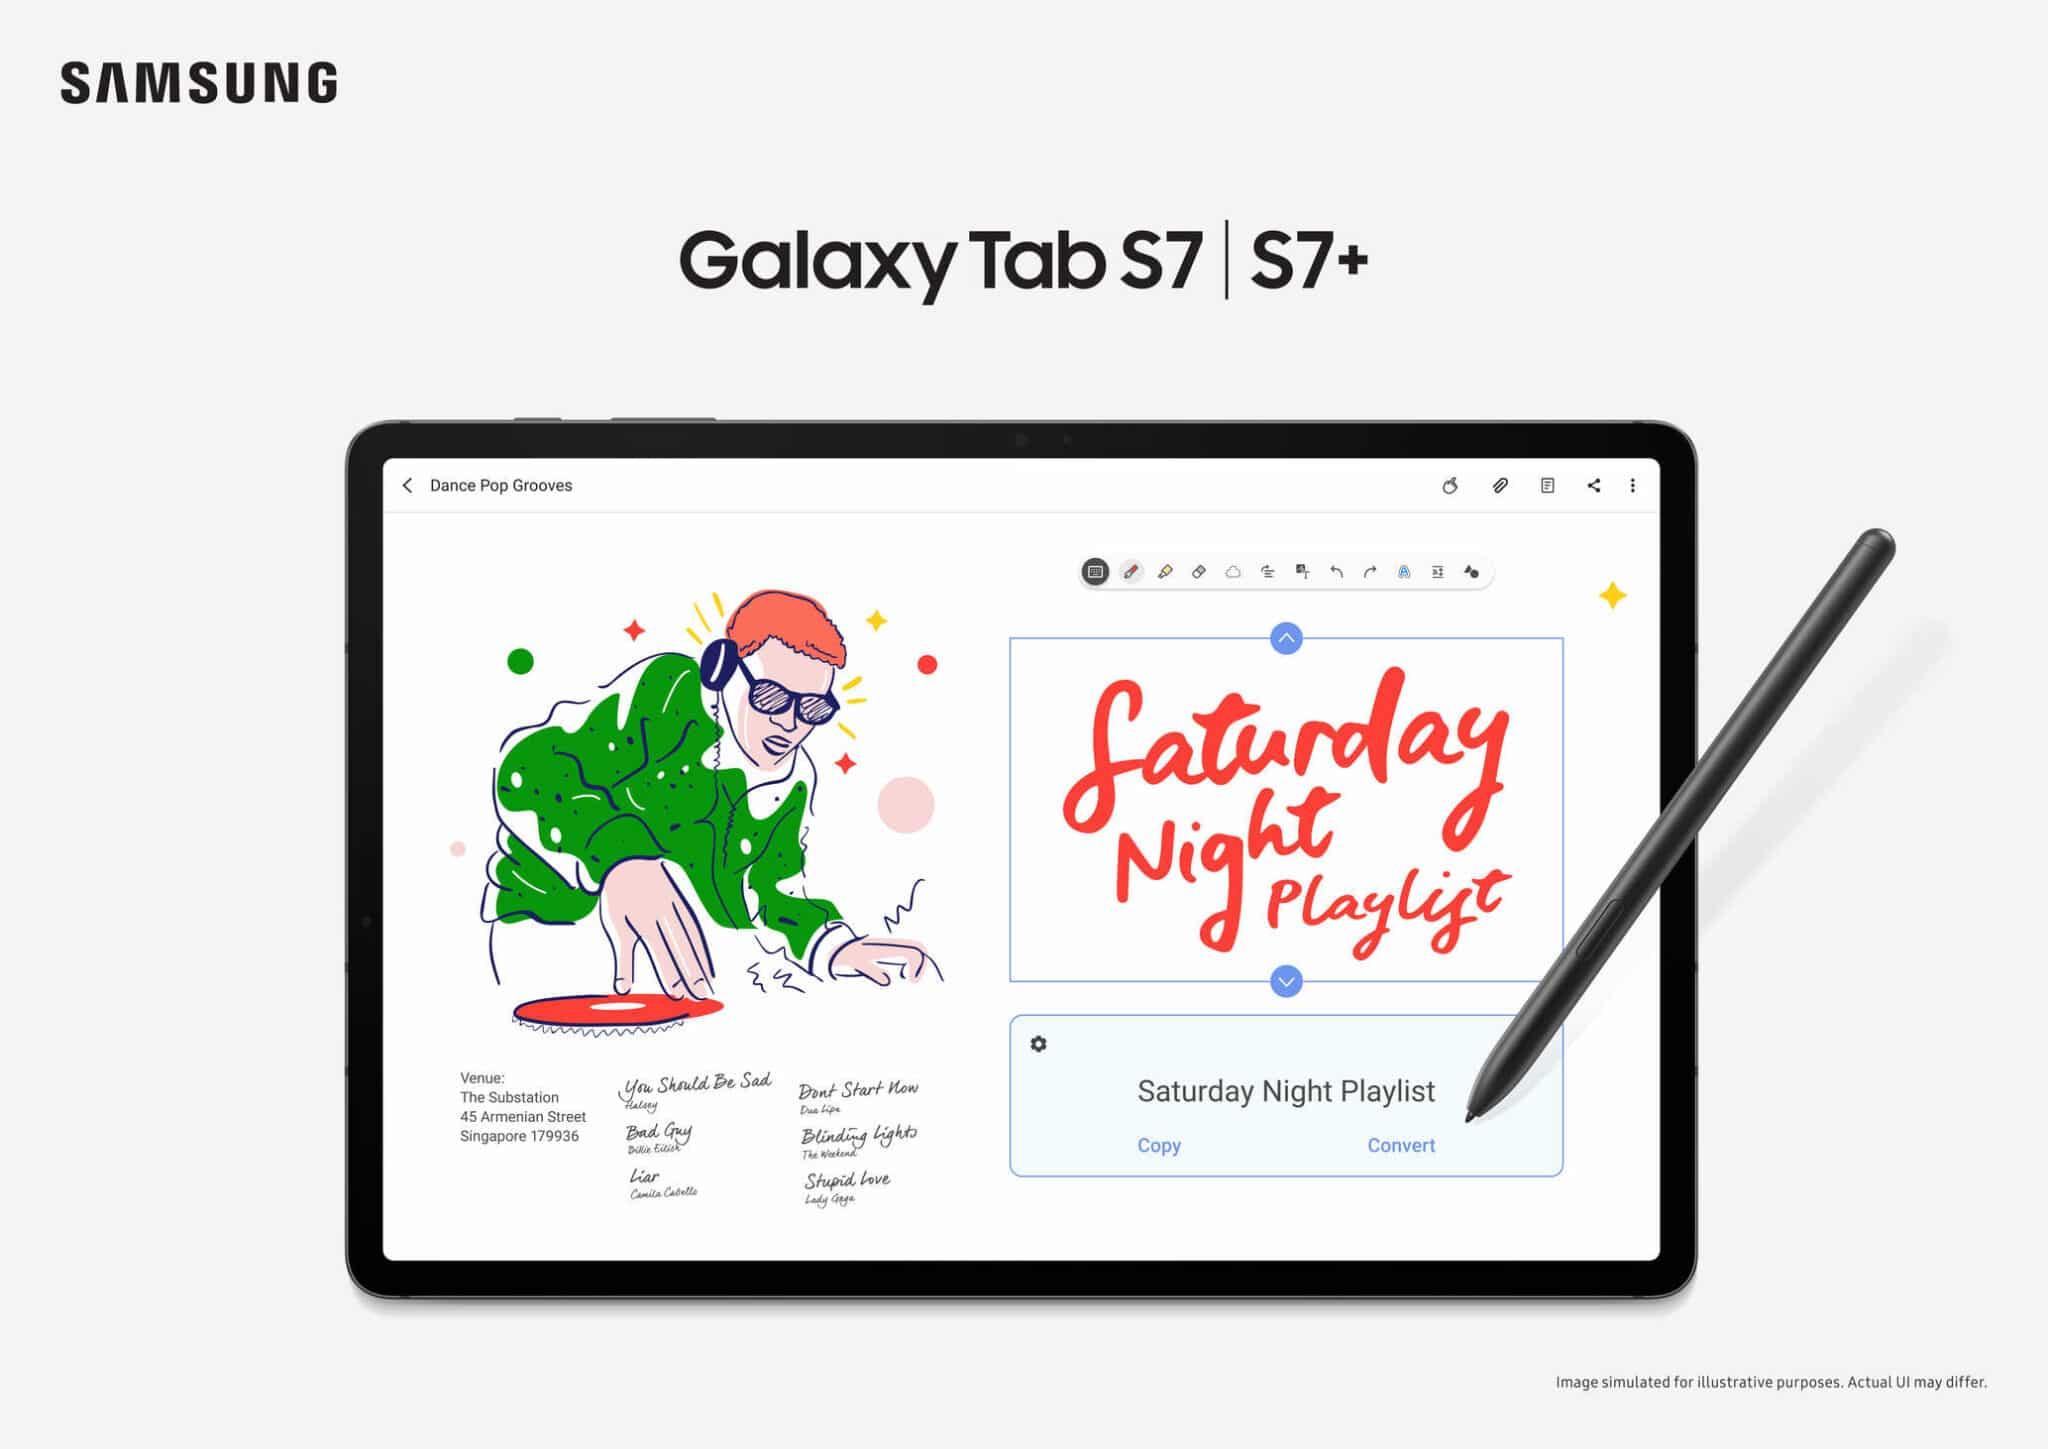 17_galaxytabs7plus_featurekv_notetaking_2p